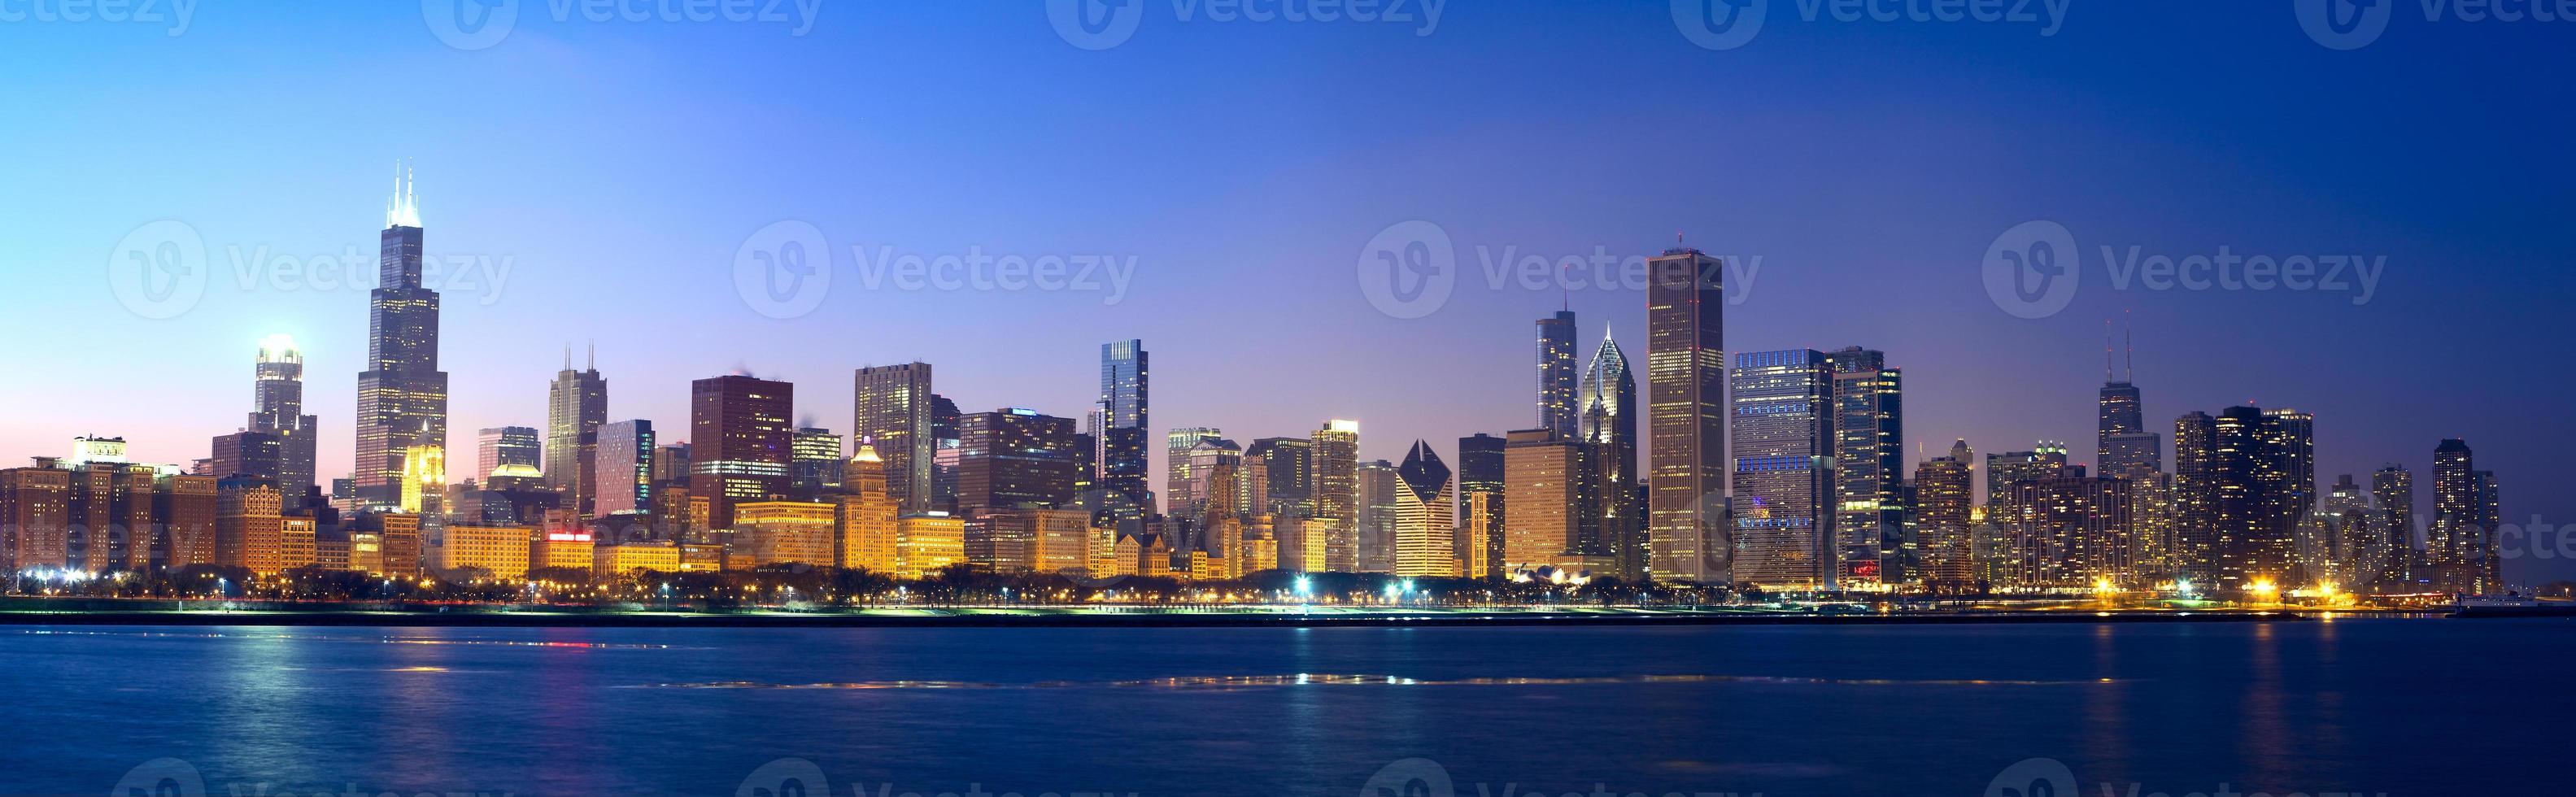 en panoramautsikt över chicago skyline foto